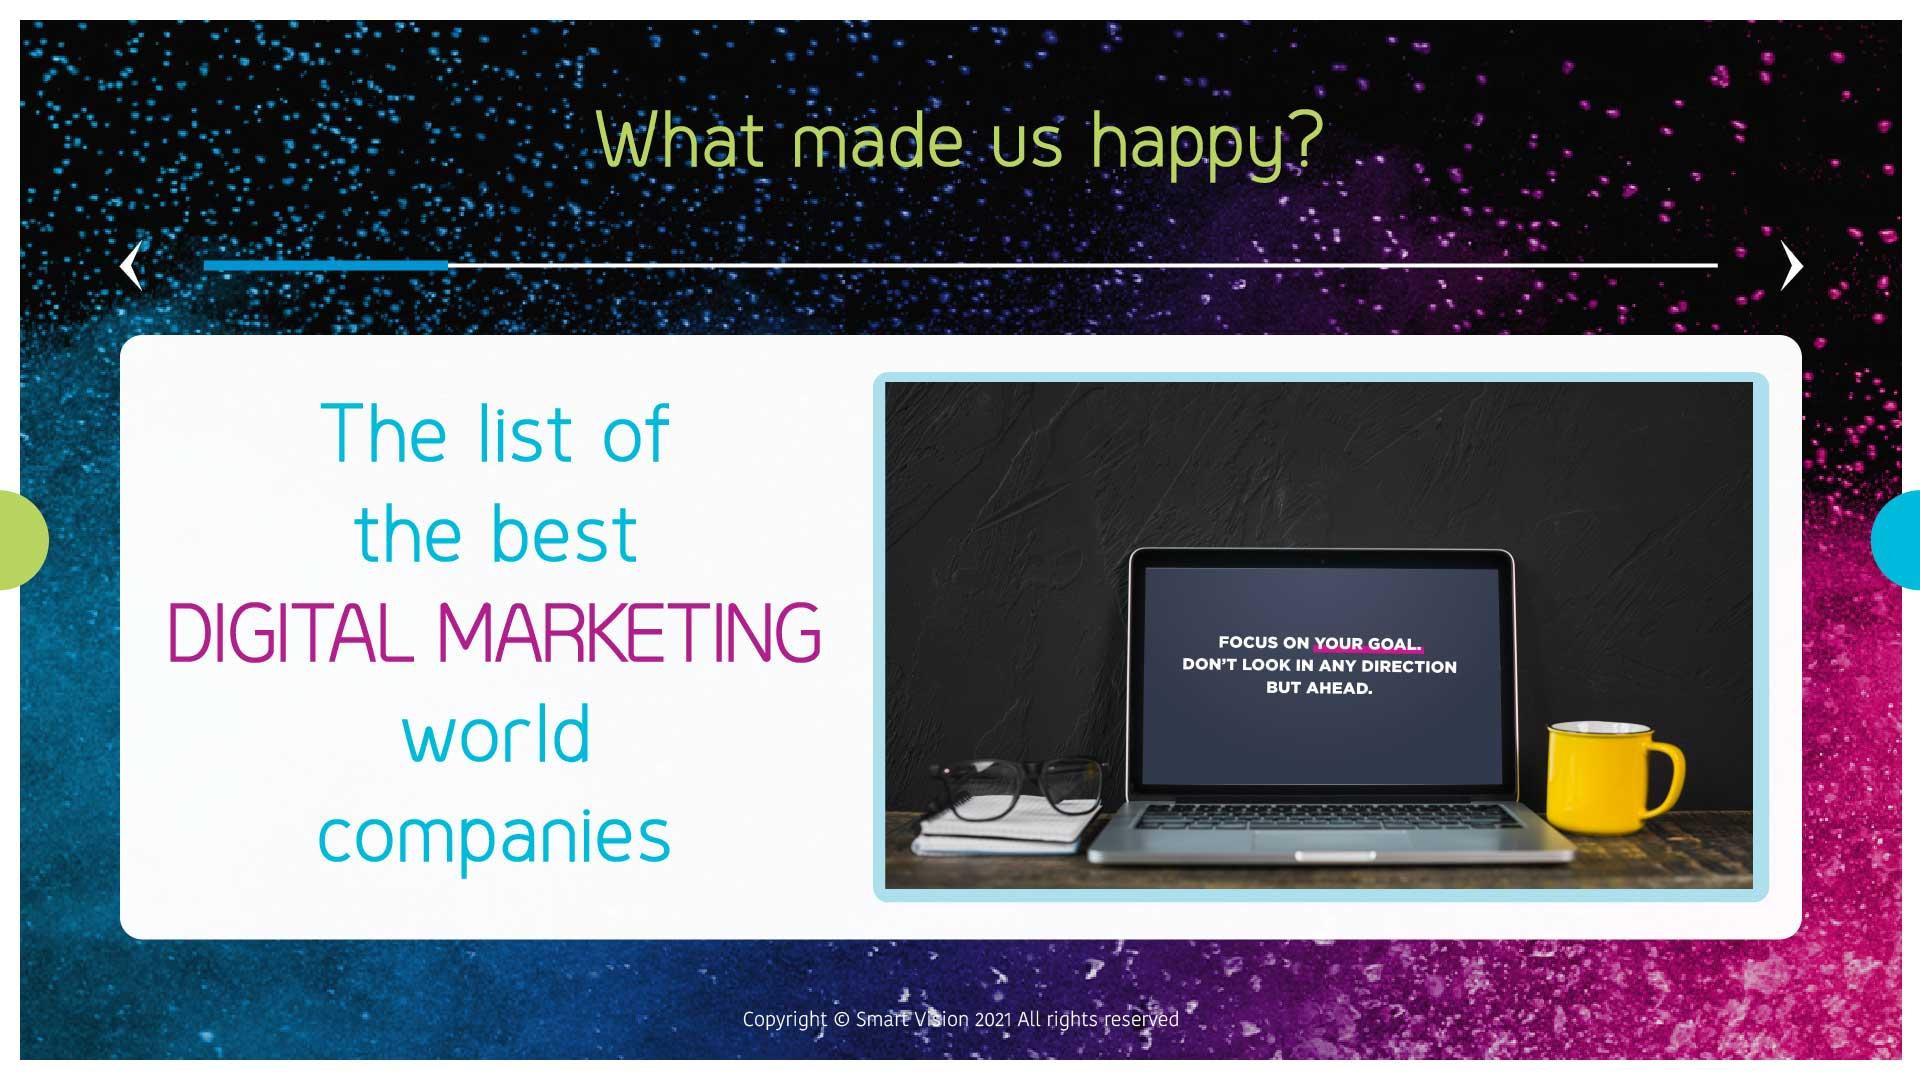 Smart Vison Blog - What Made Us Happy